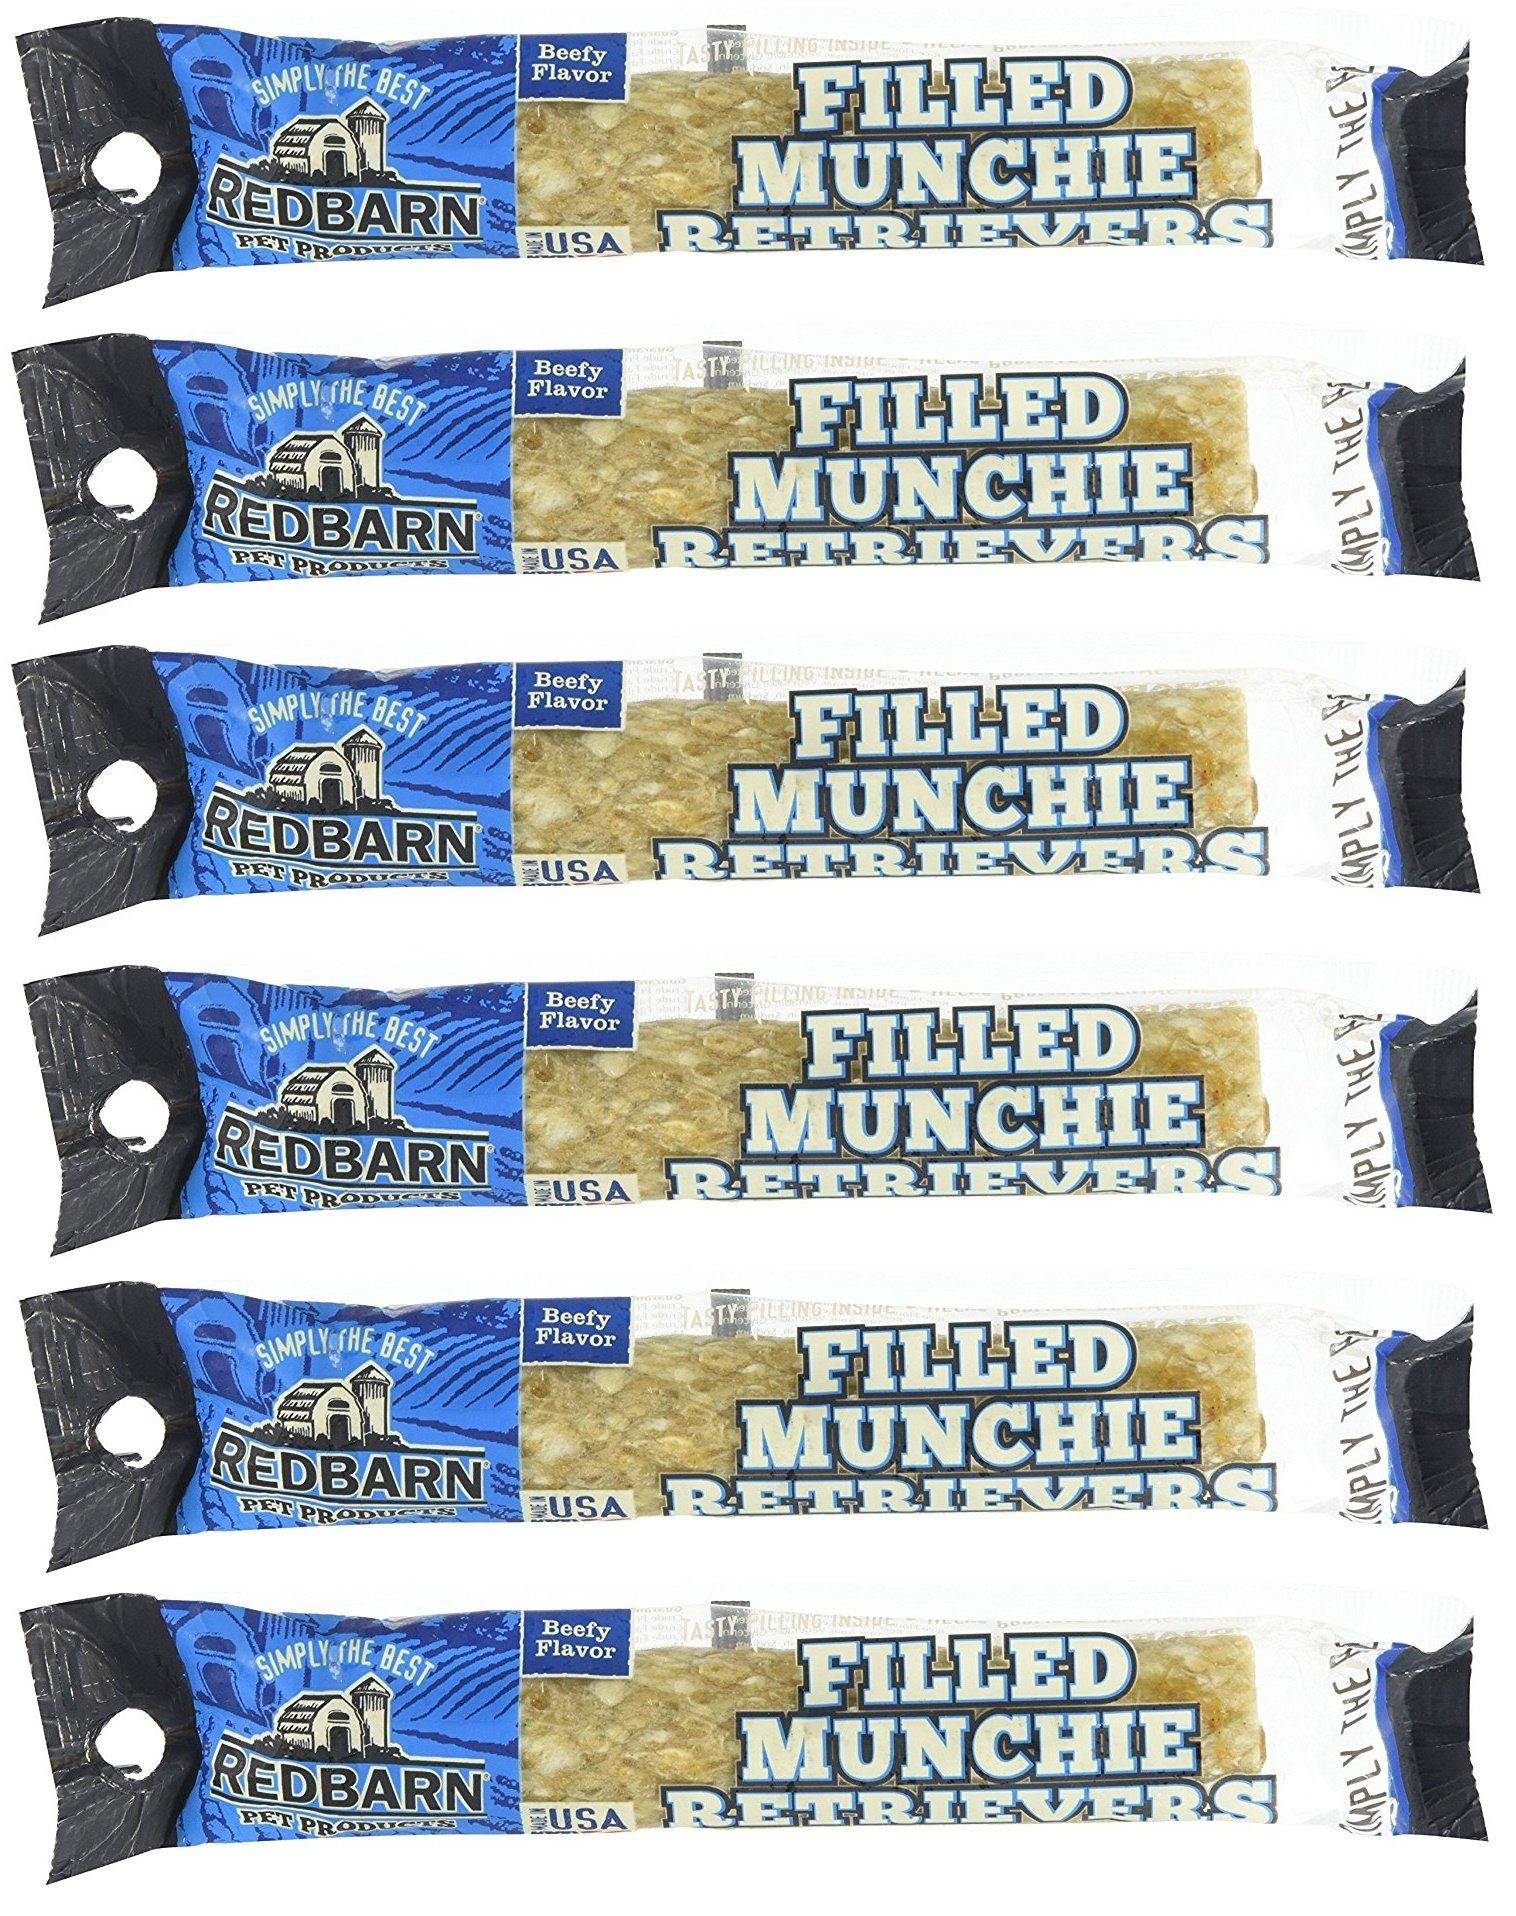 (6 Pack) Redbarn - Filled Munchie Retriever Roll, Beef